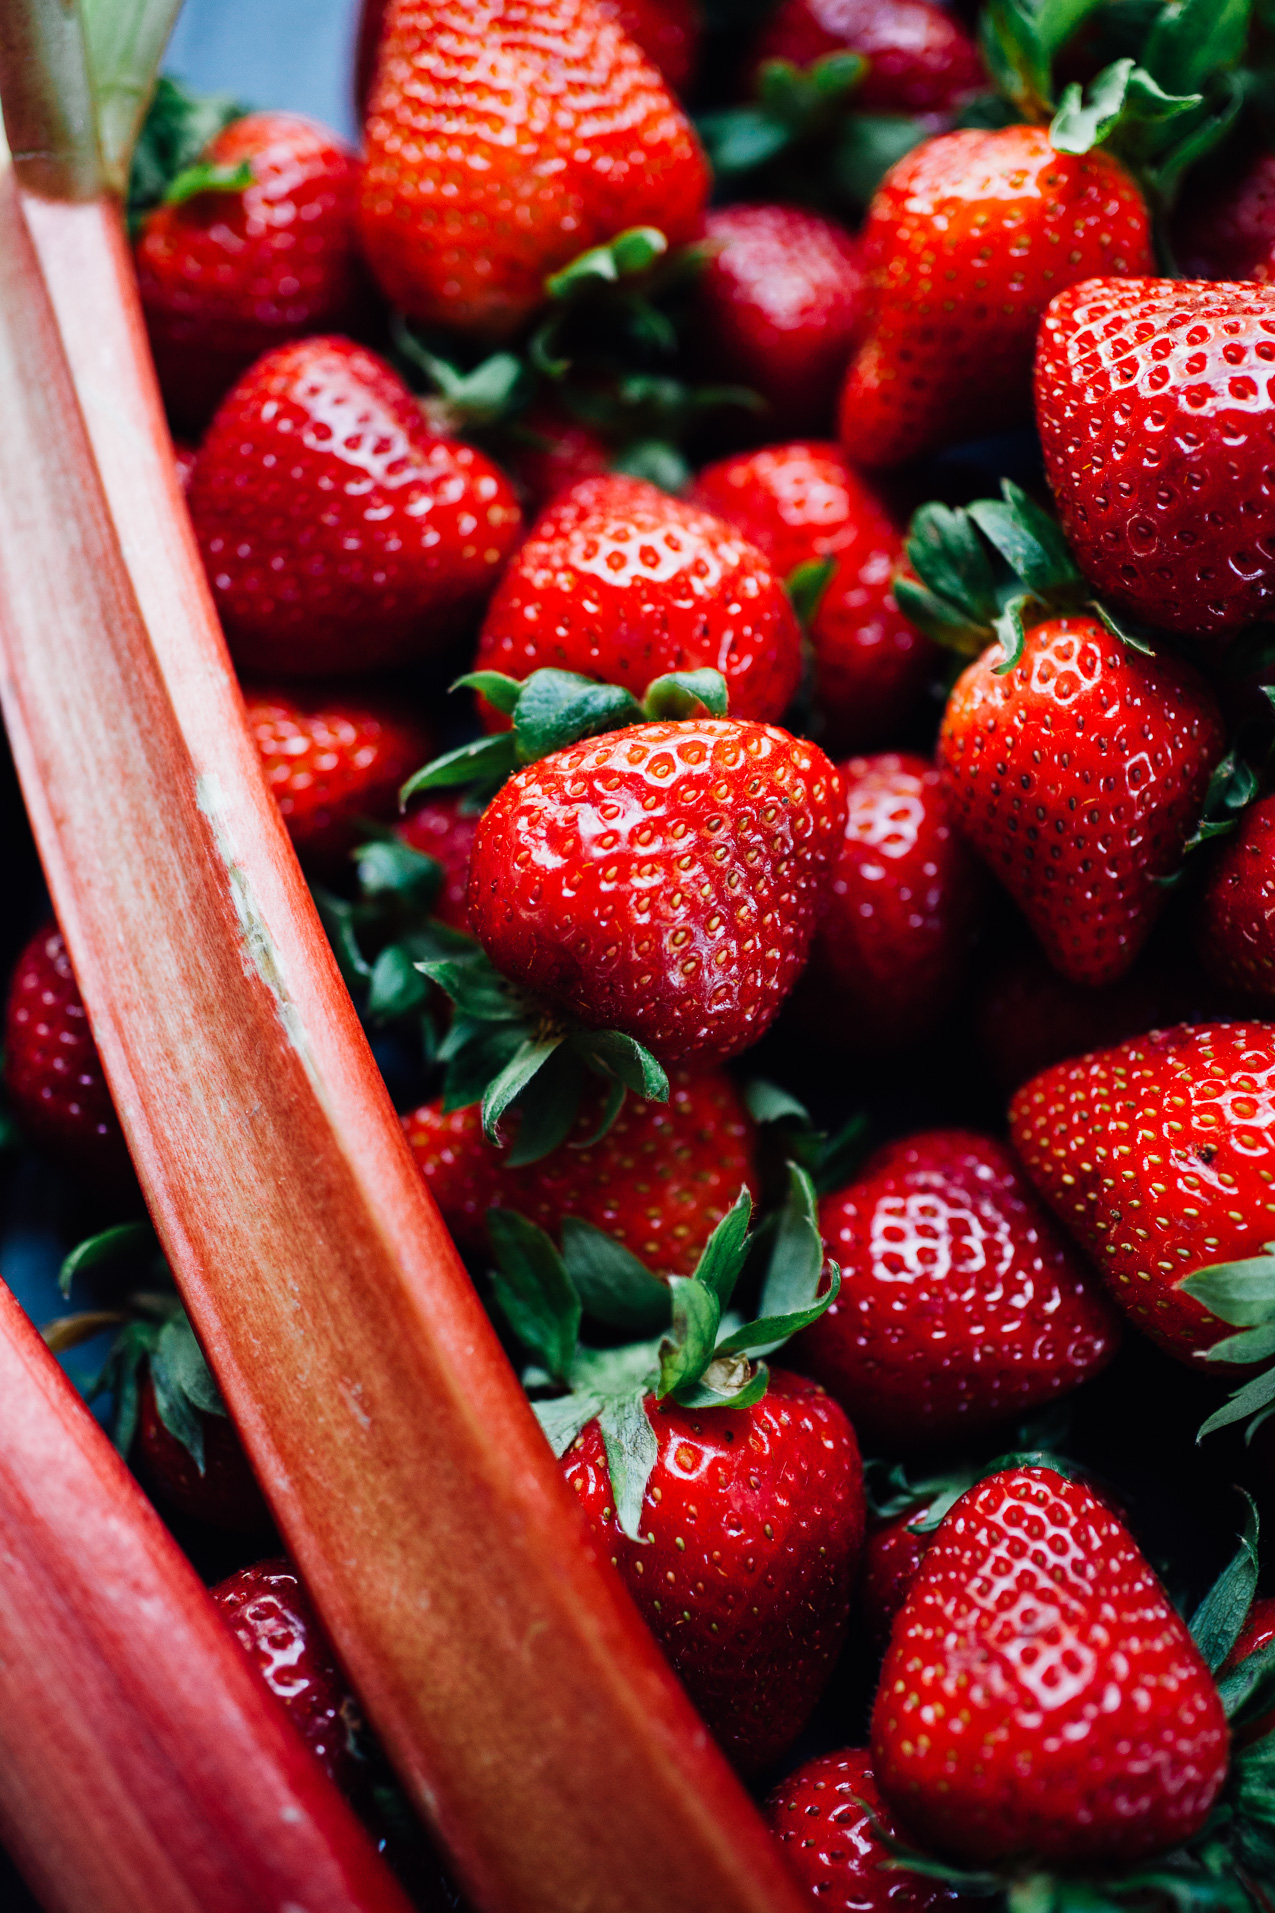 roasted strawberry rhubarb agua fresca   refined sugar free recipe via willfrolicforfood.com